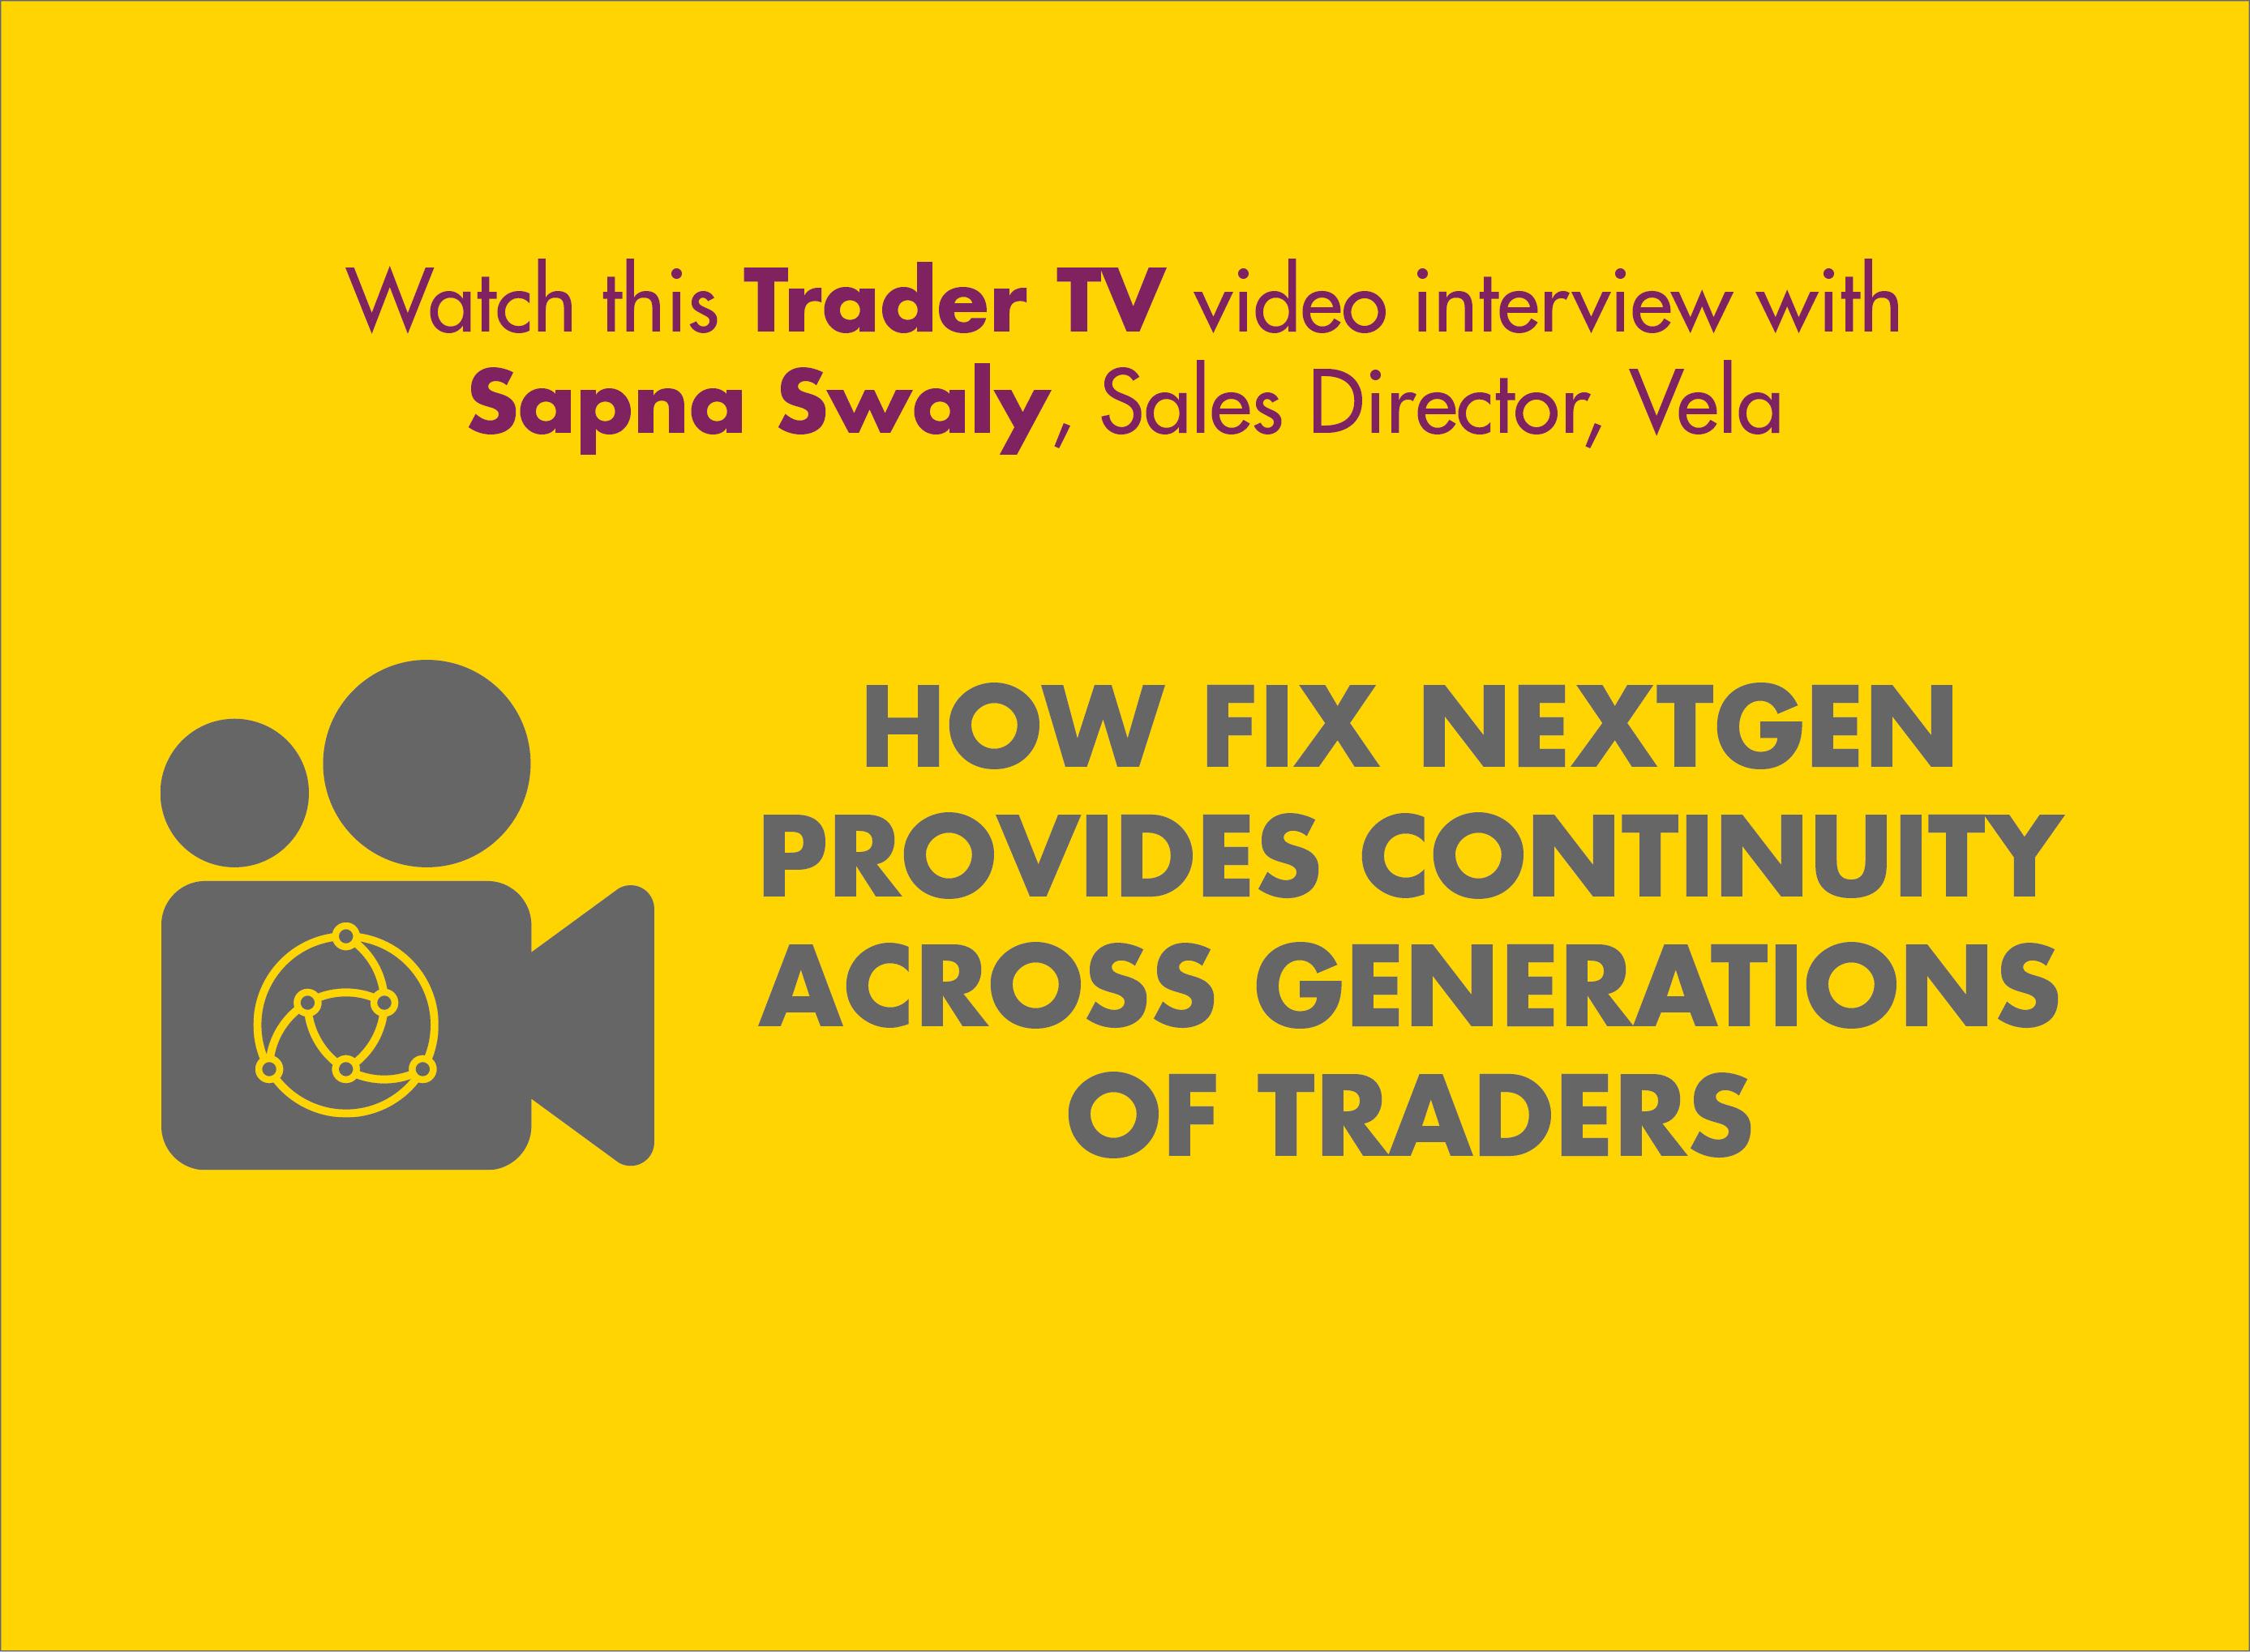 FIX NextGen: Providing continuity across generation of traders